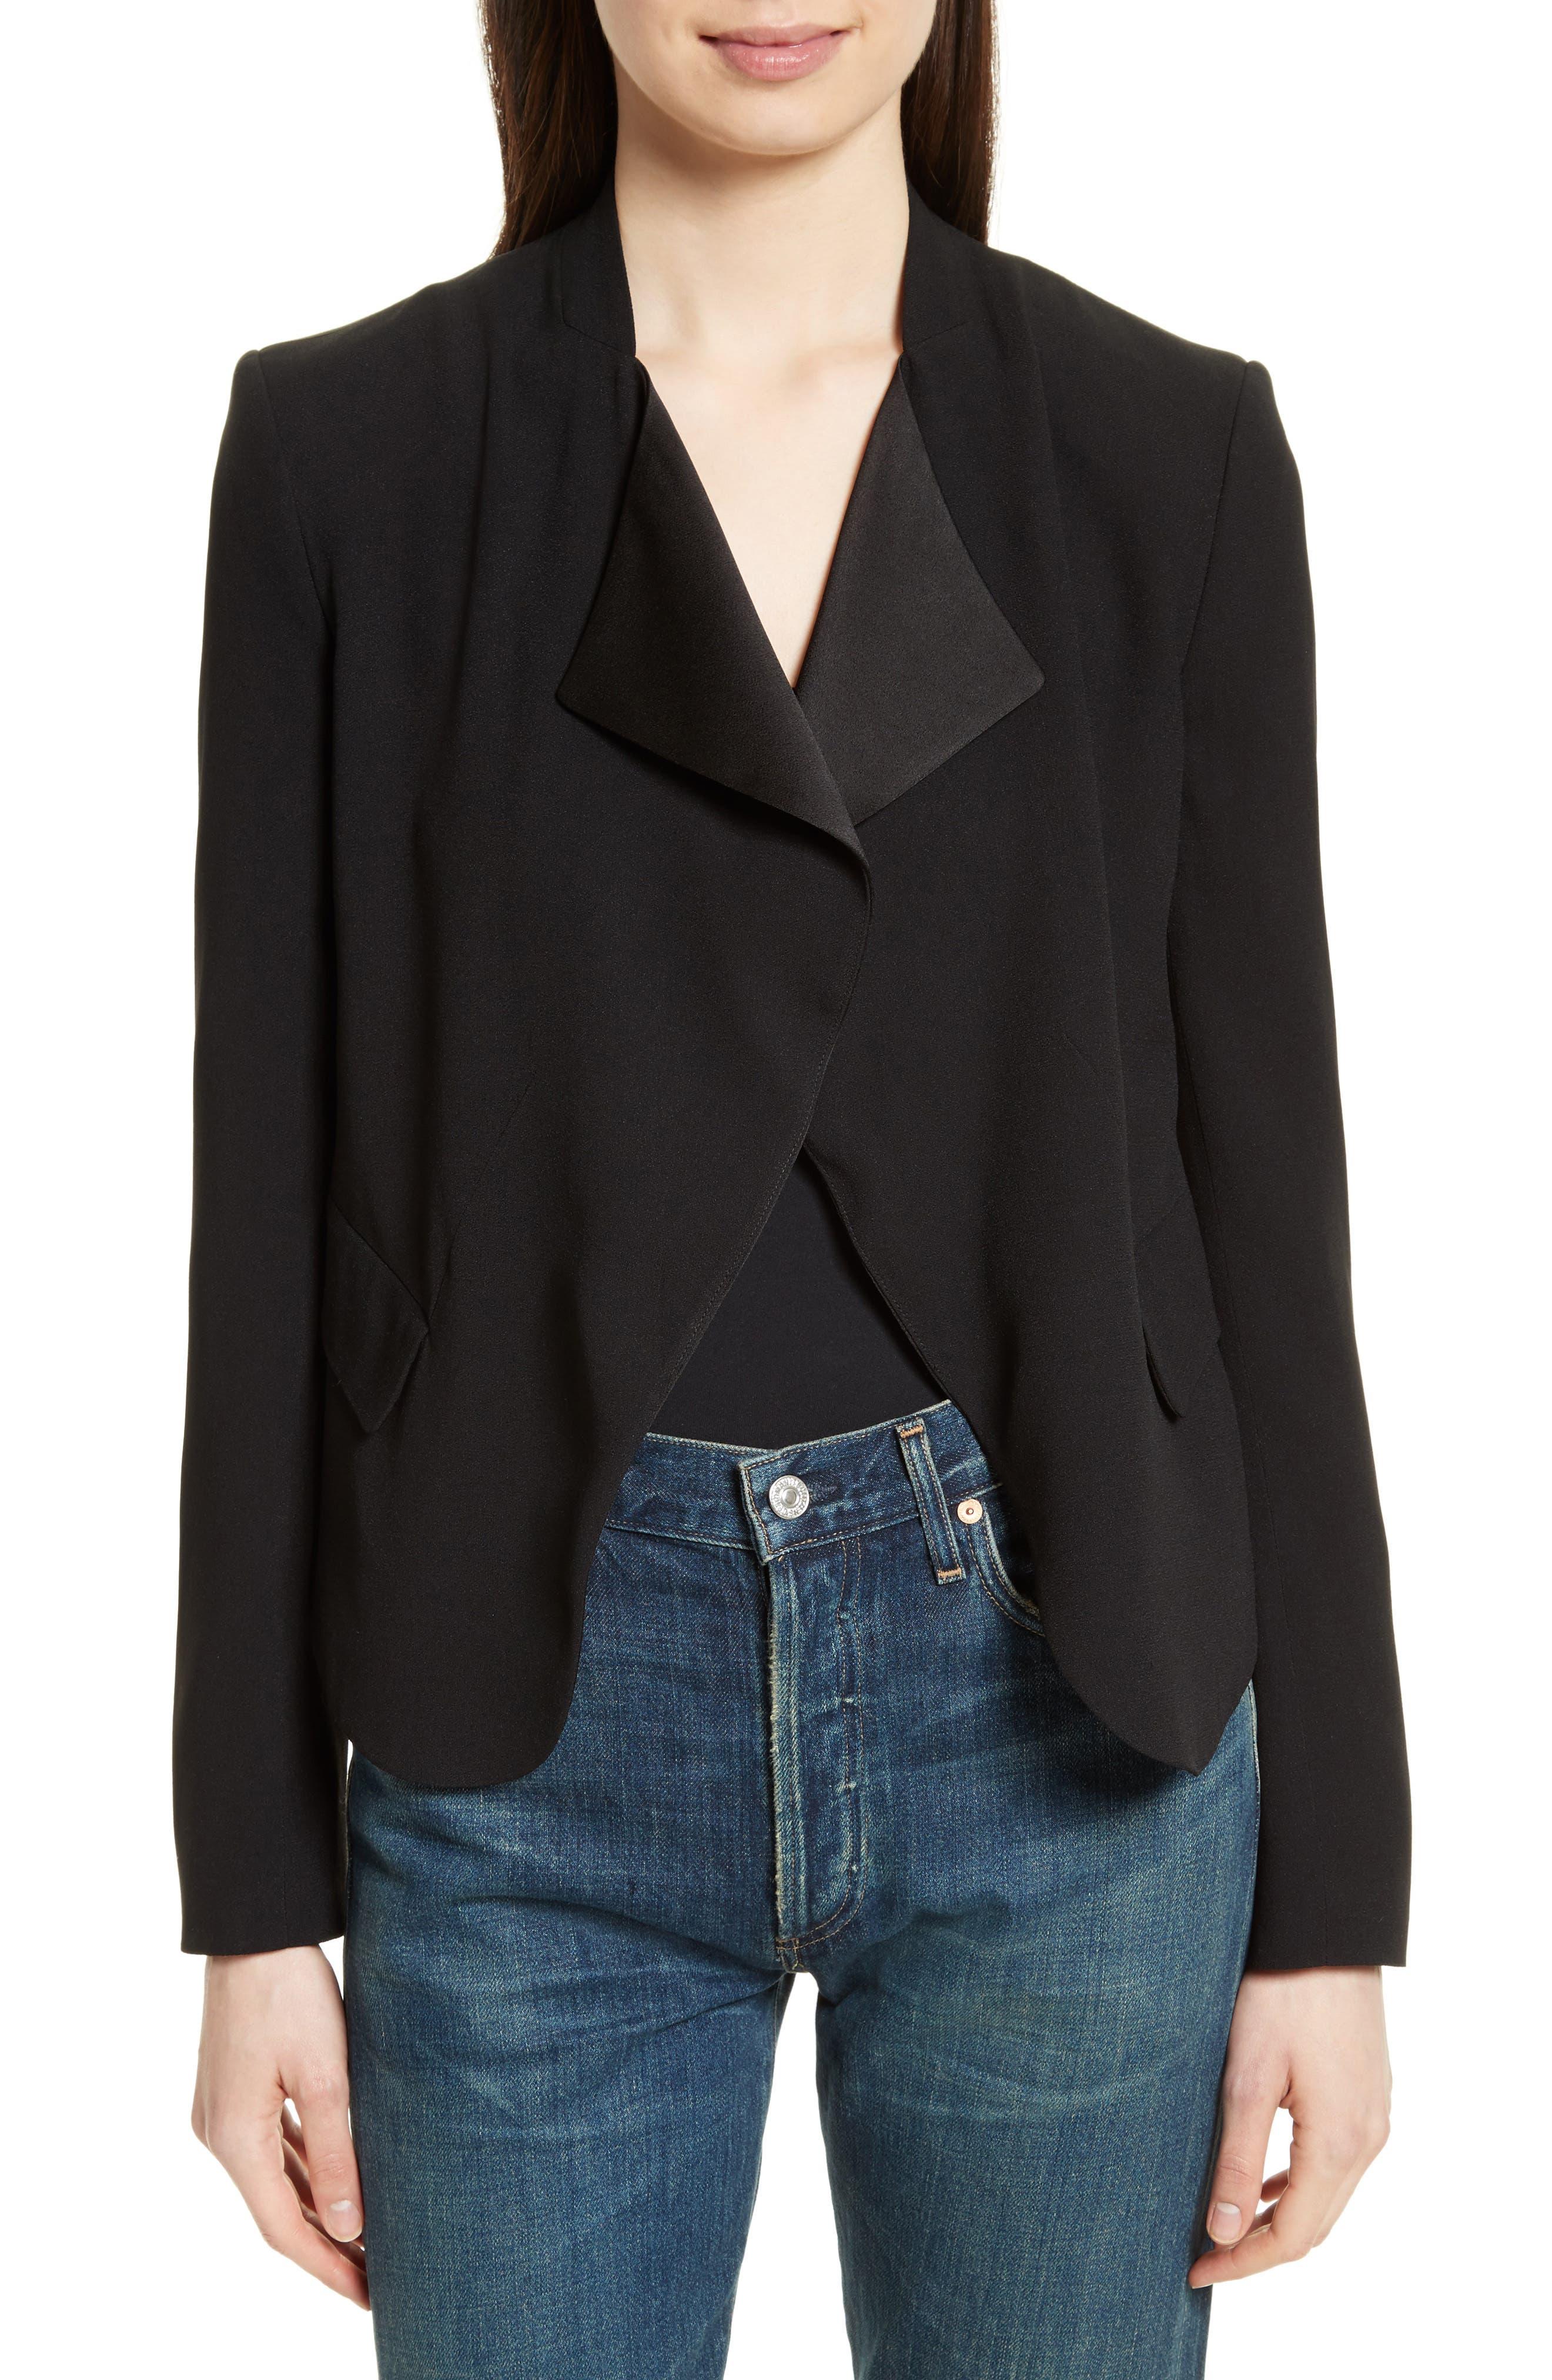 Kensington Peplum Jacket,                         Main,                         color, Black